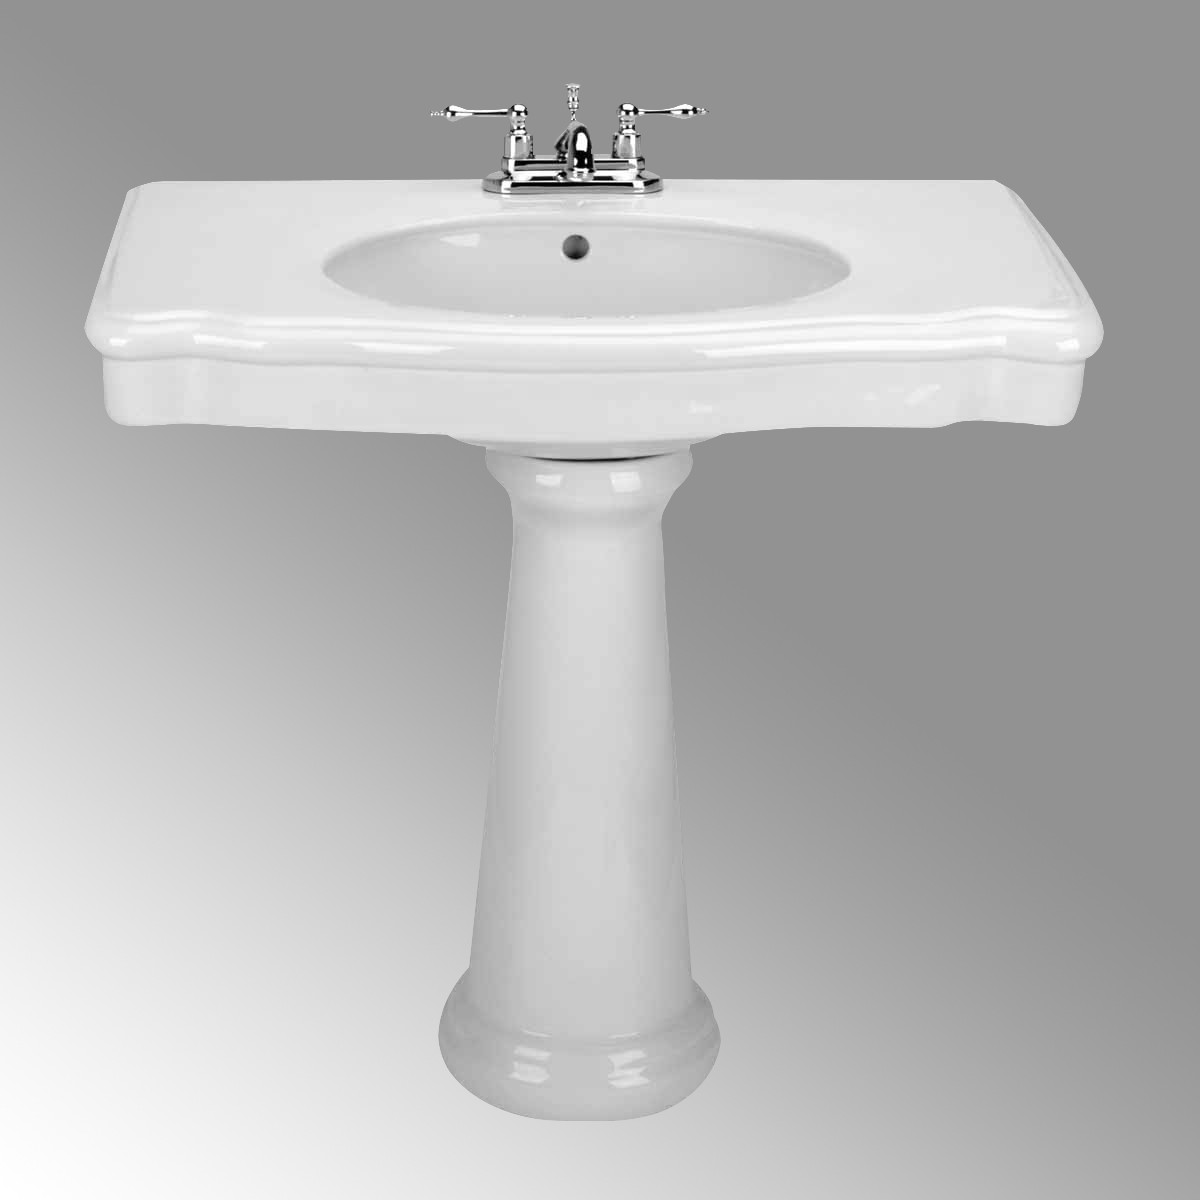 Pedestal Sink Bathroom Console White China Darbyshire